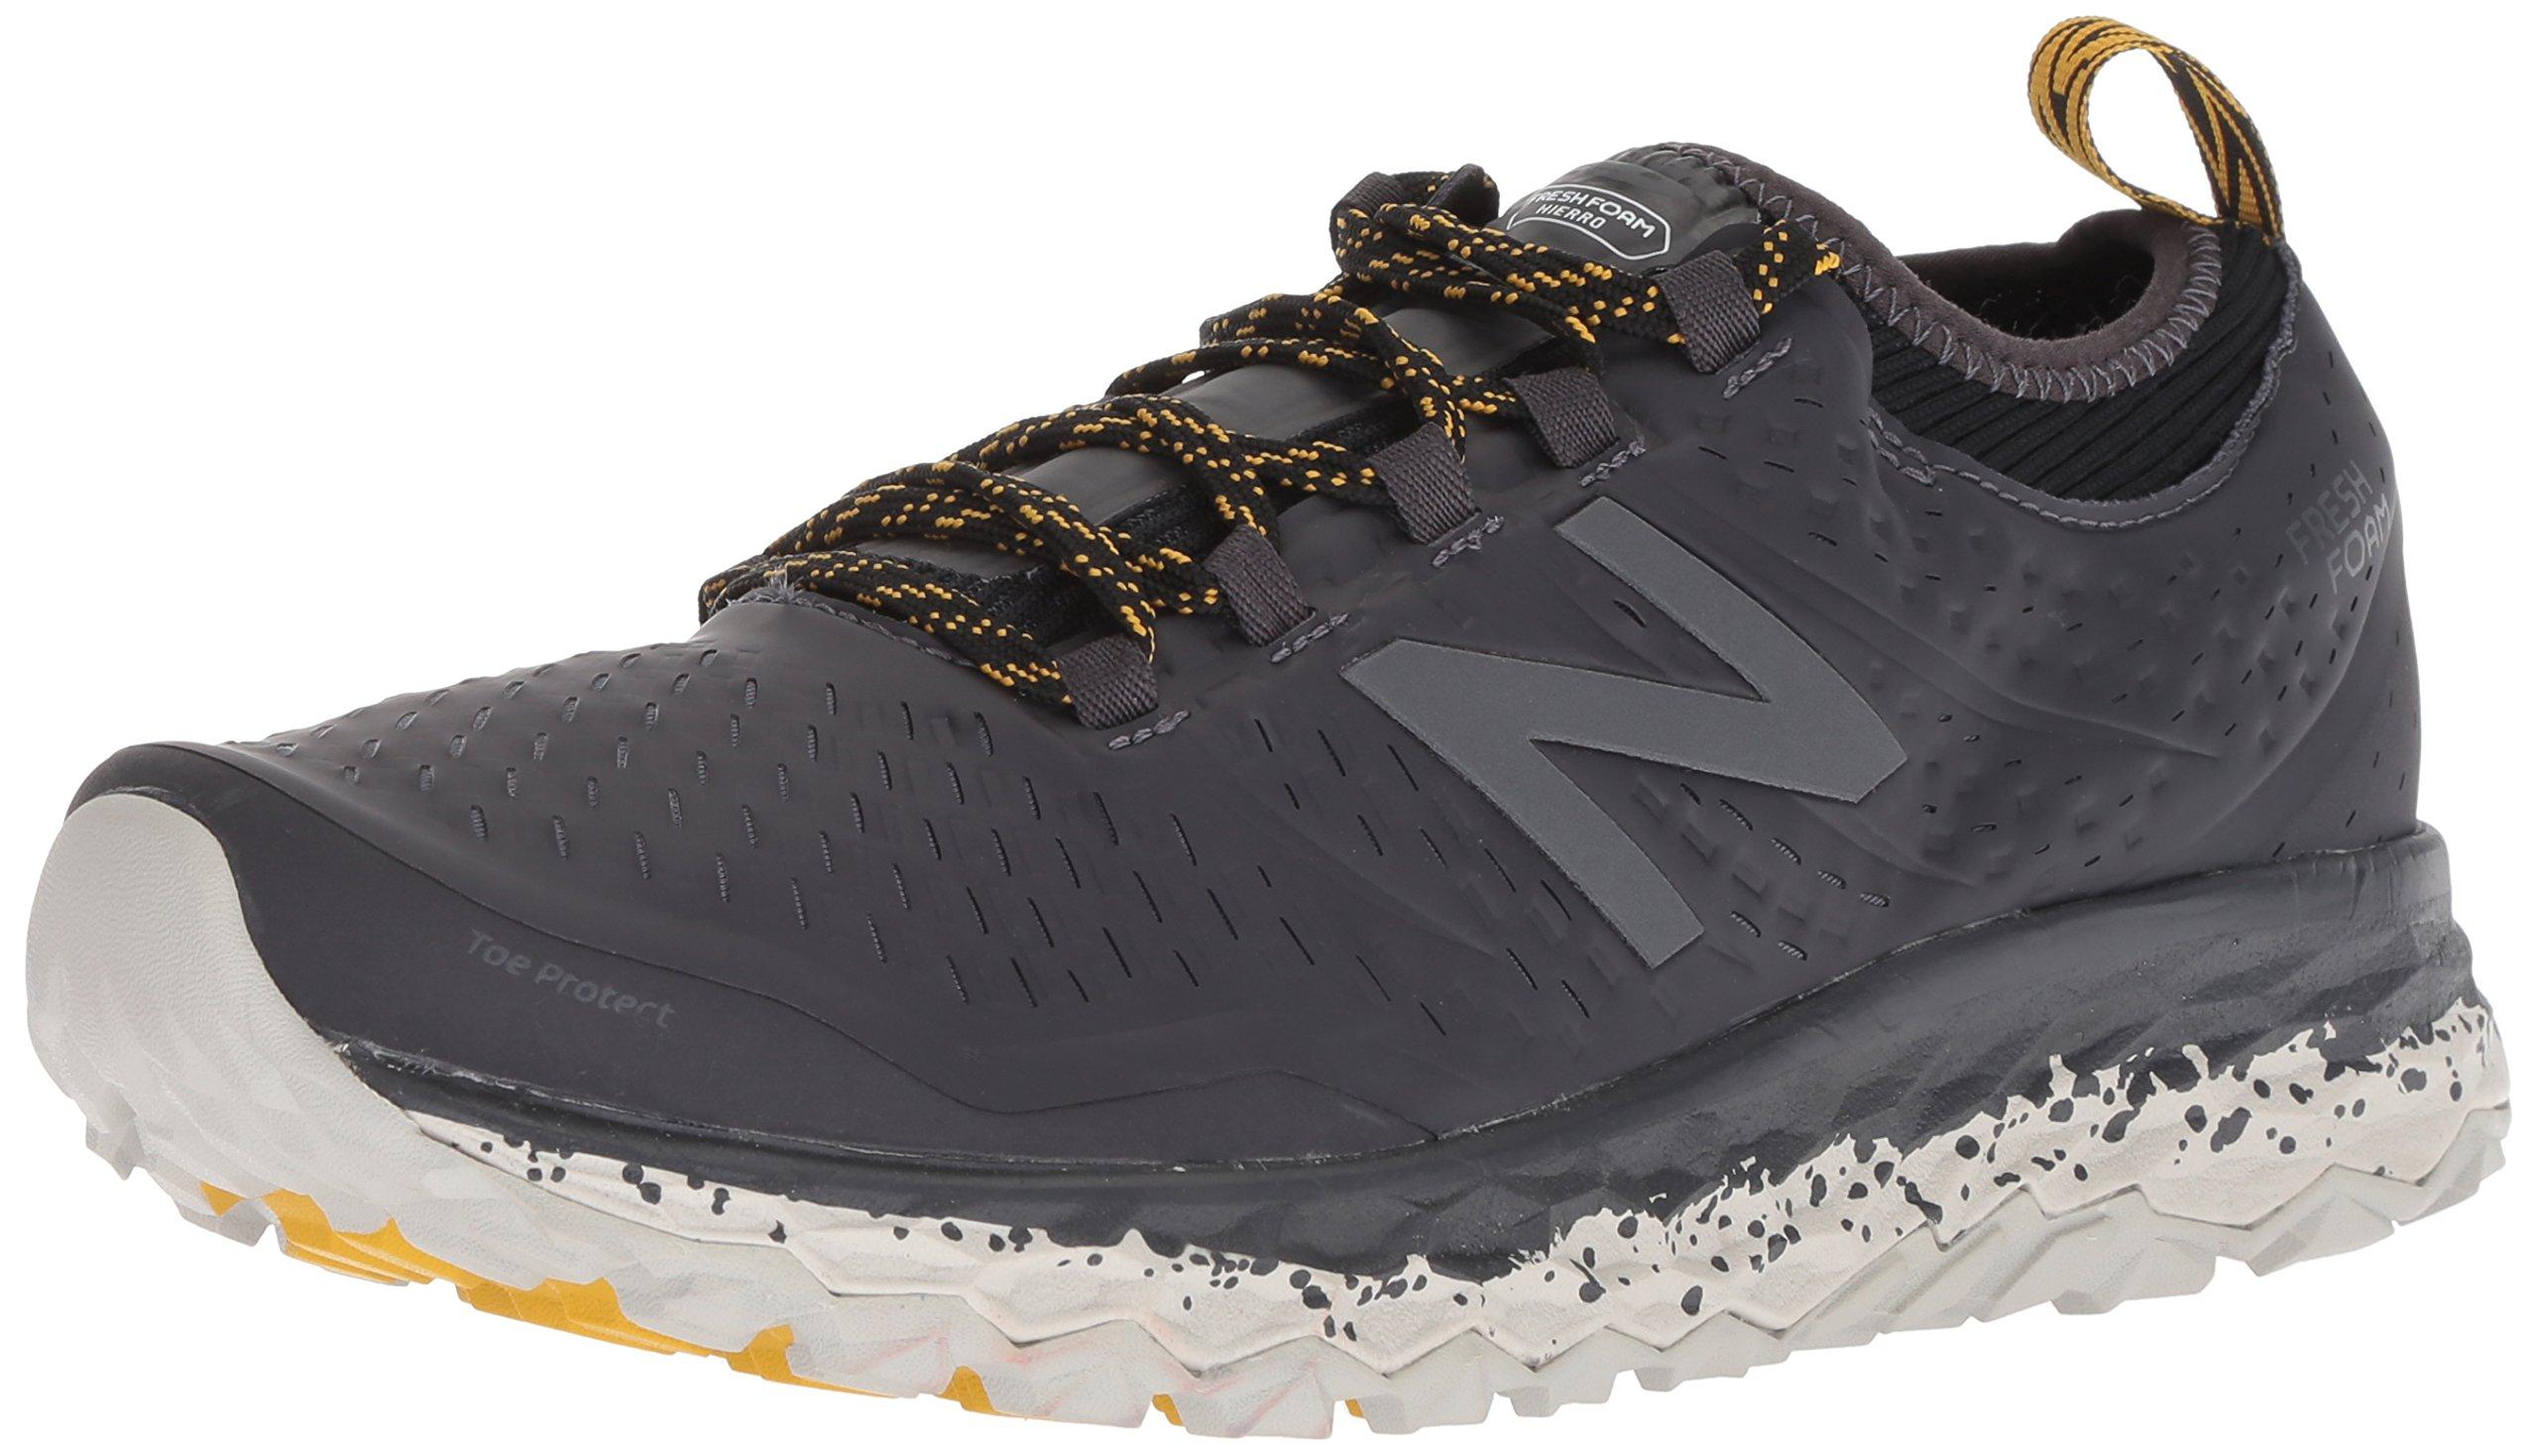 New Balance Men's Fresh Foam Hierro V3 Trail Running Shoes